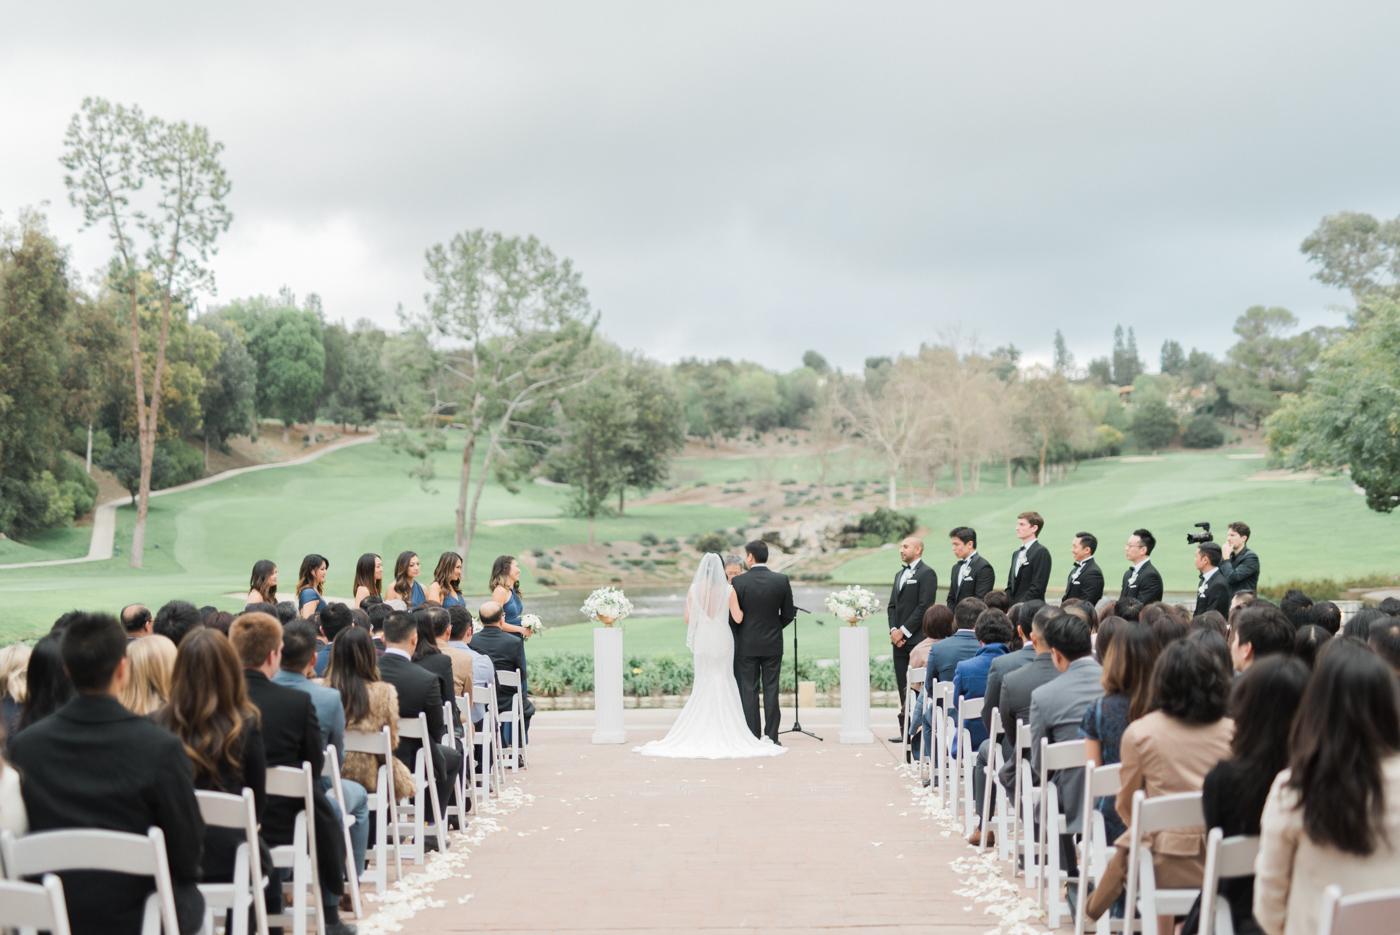 Friendly_Hills_Country_Club_fine_art_wedding_photographer_los_angeles_paris-30.jpg